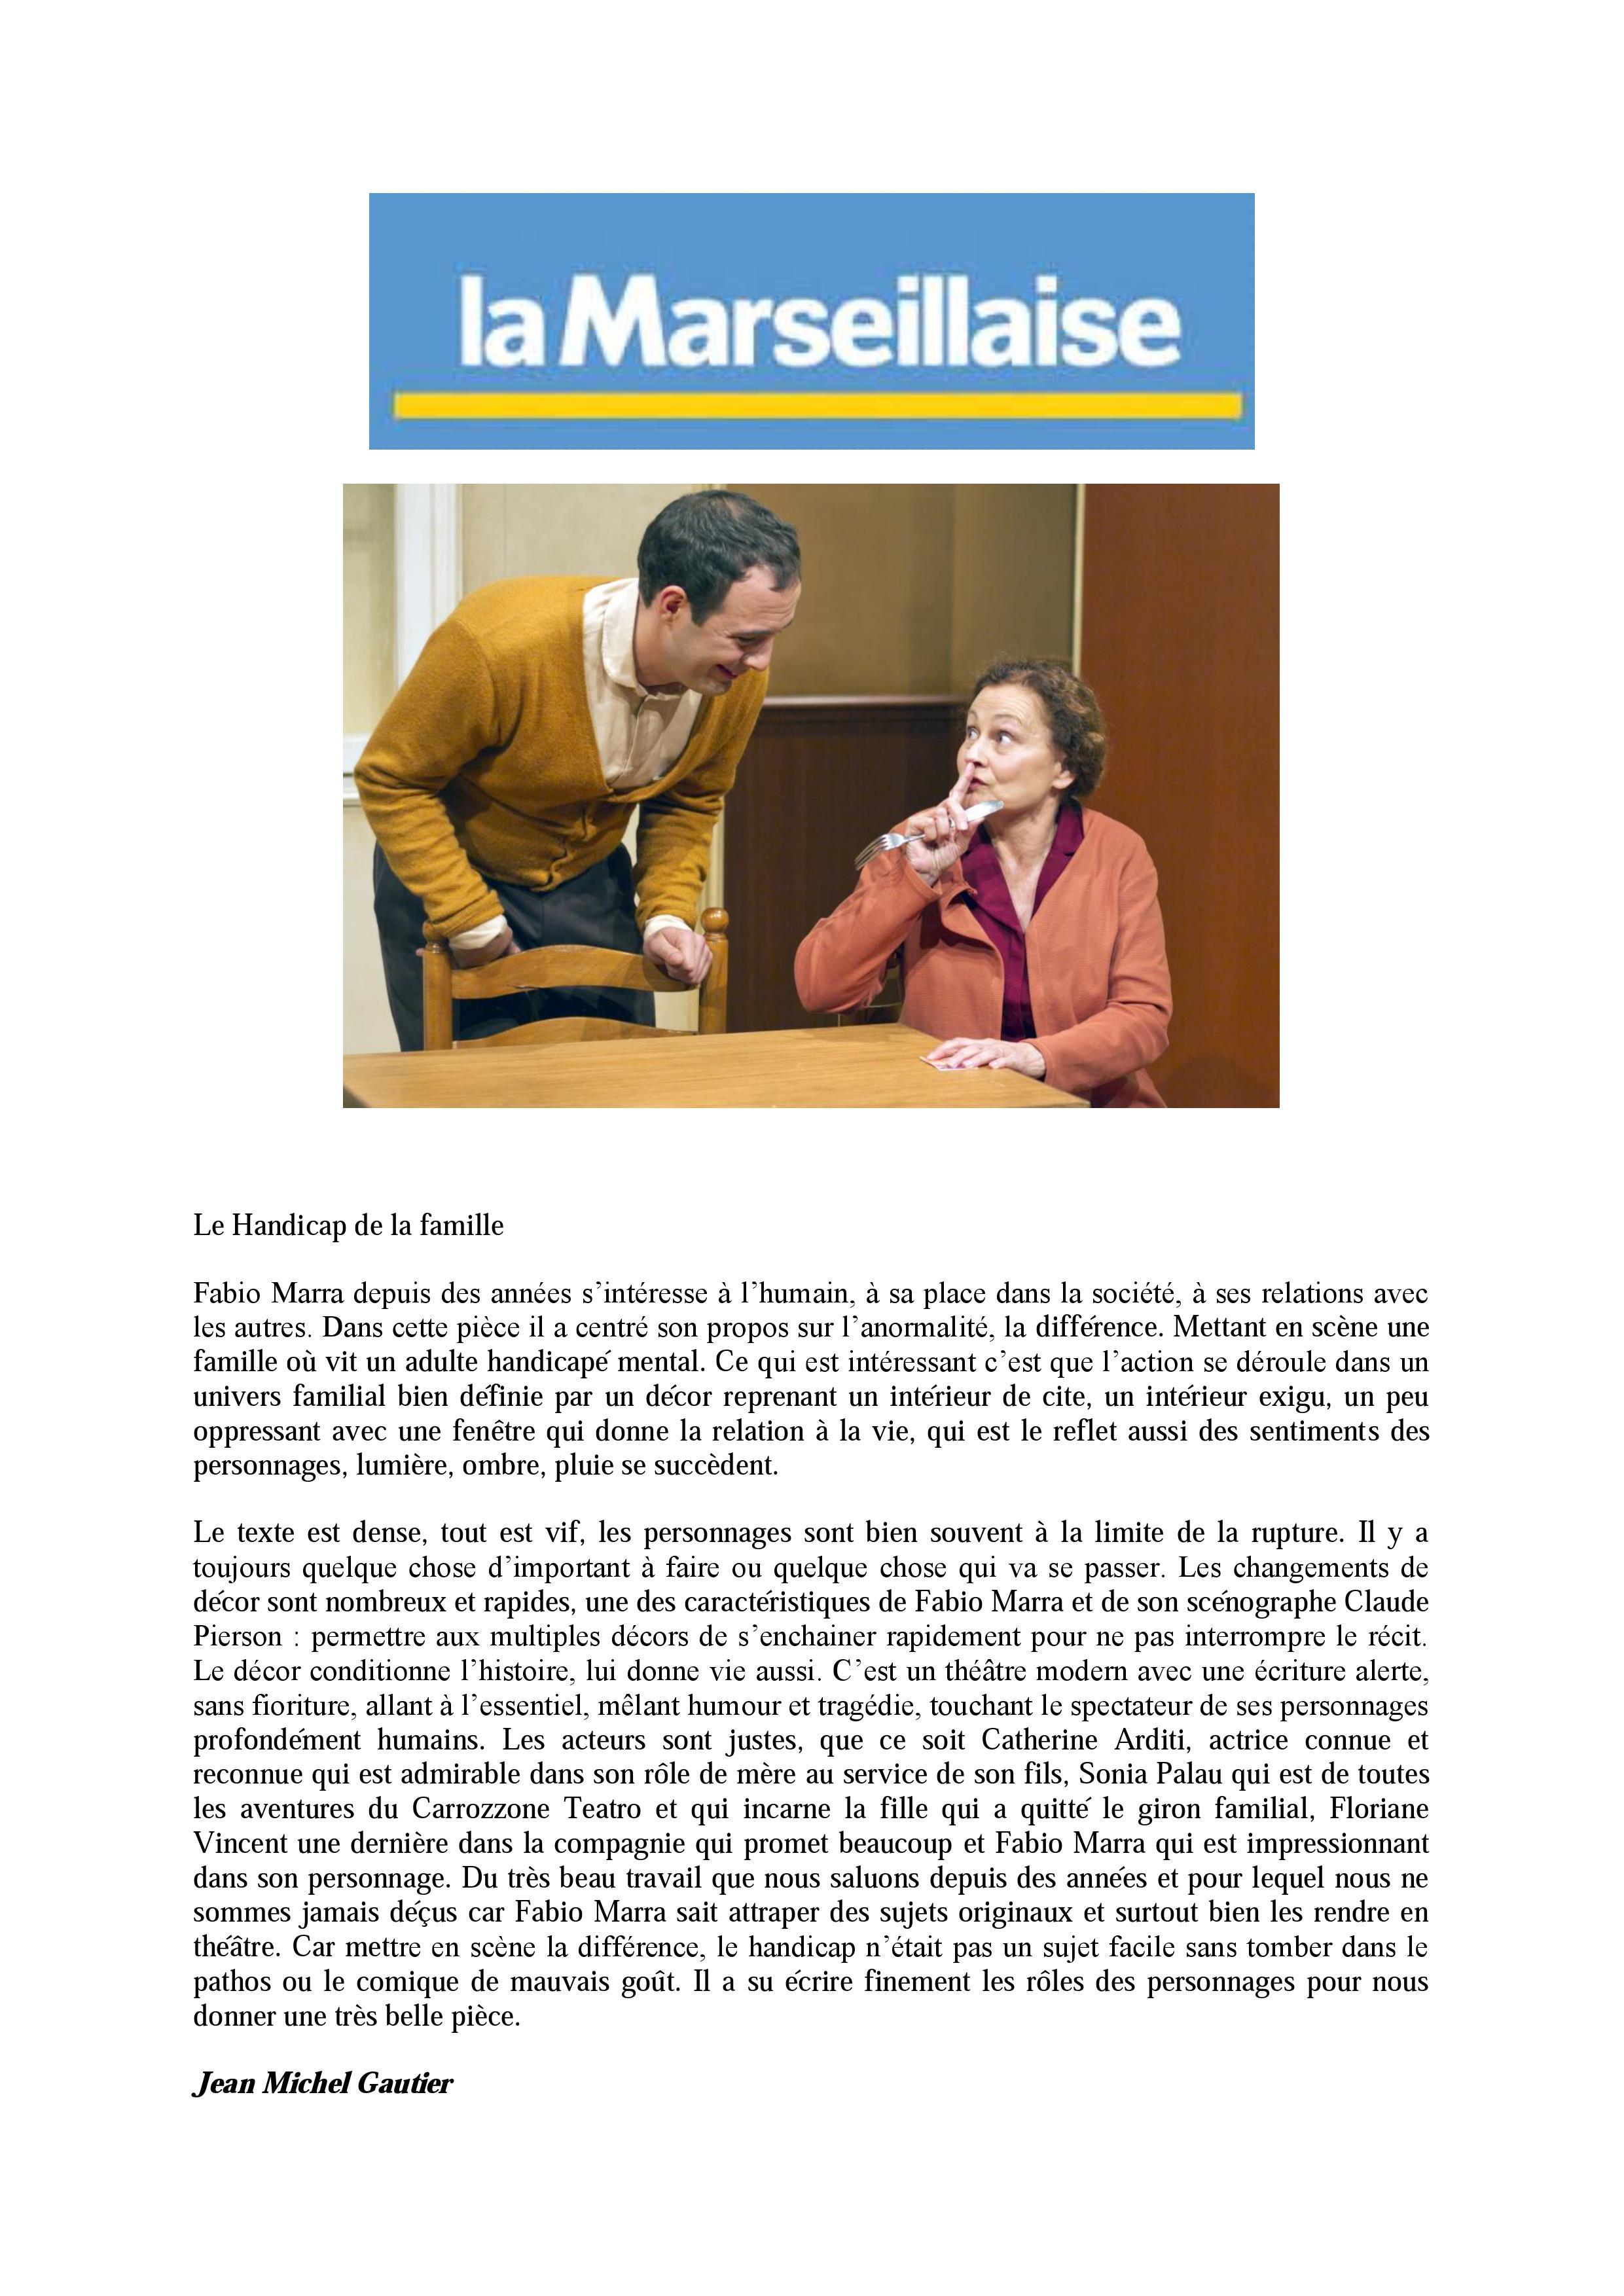 marseillaise-2eme-article